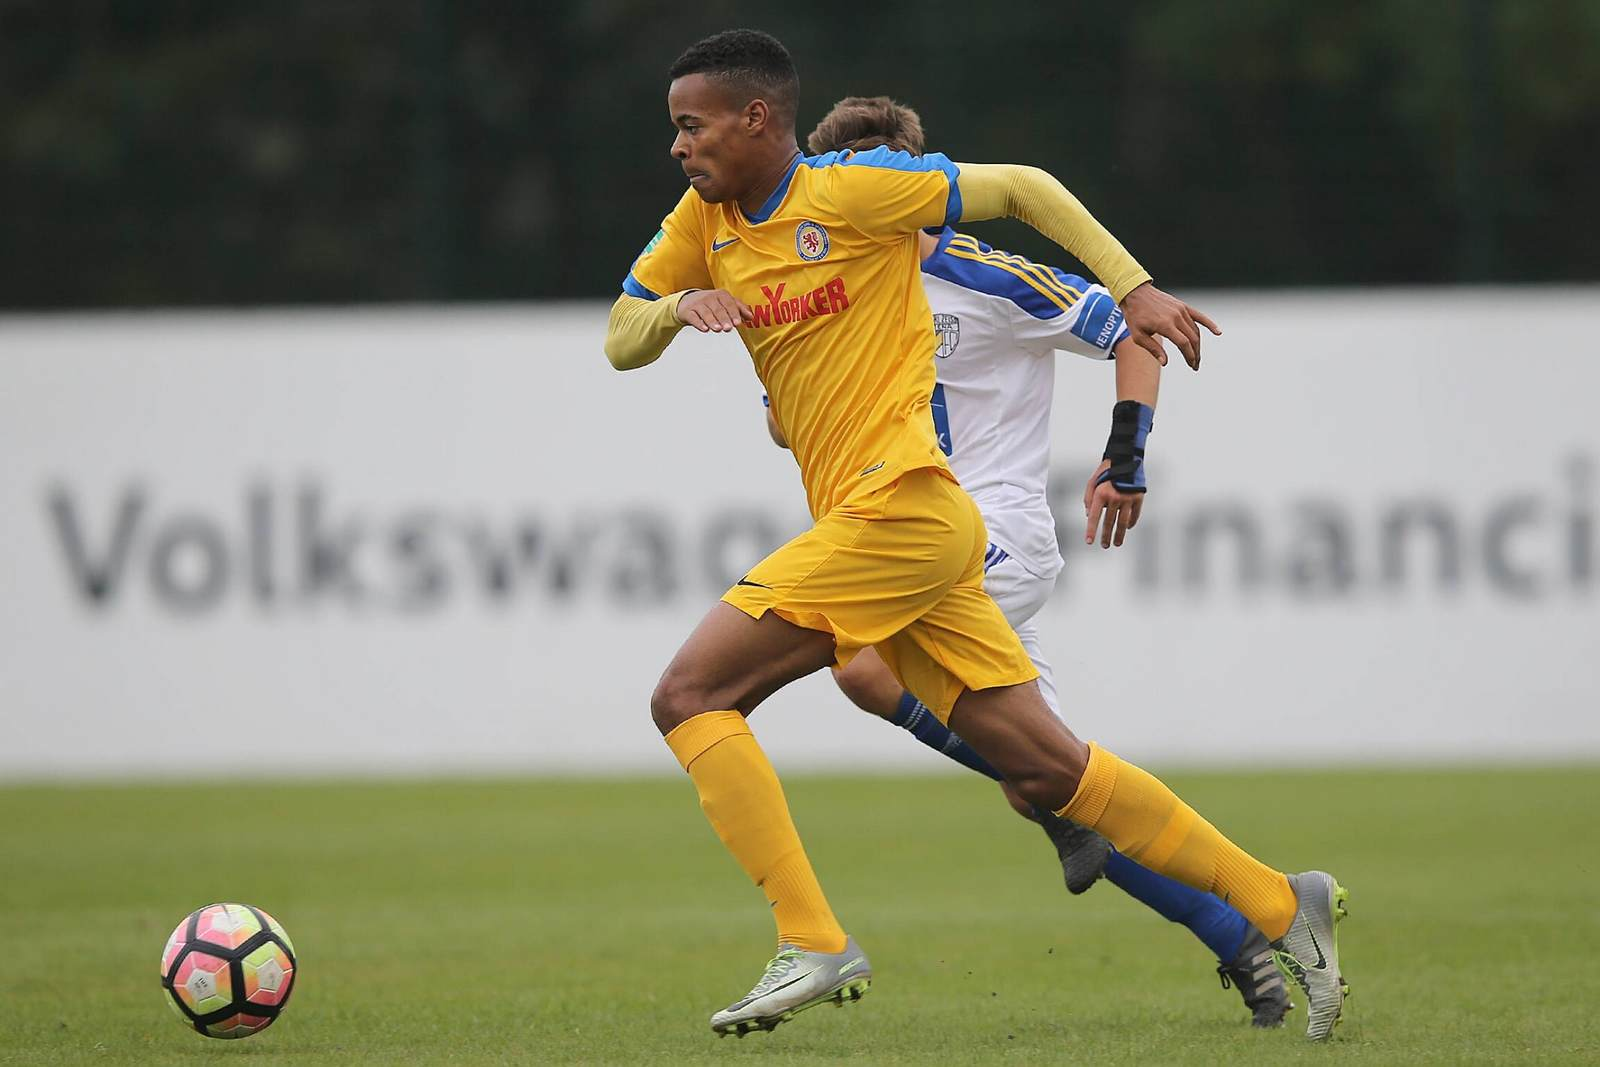 Ayodele Adetula am Ball für die A-Jugend Braunschweigs